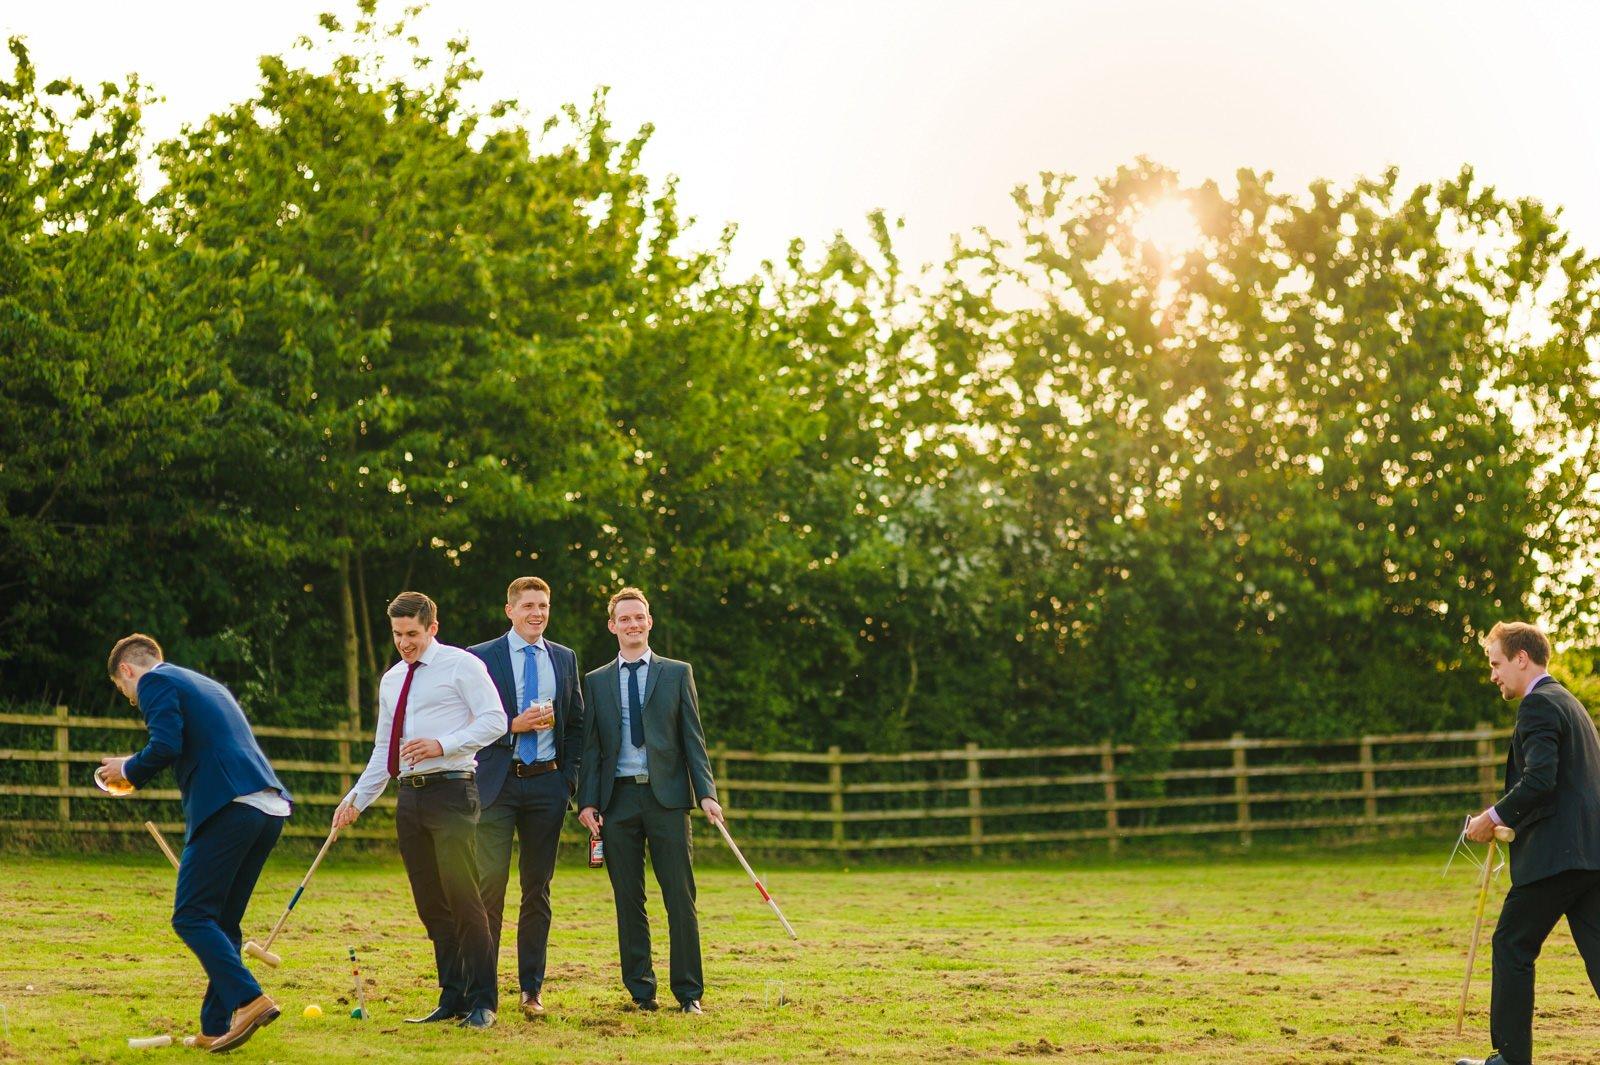 Millers Of Netley wedding, Dorrington, Shrewsbury | Emma + Ben 76